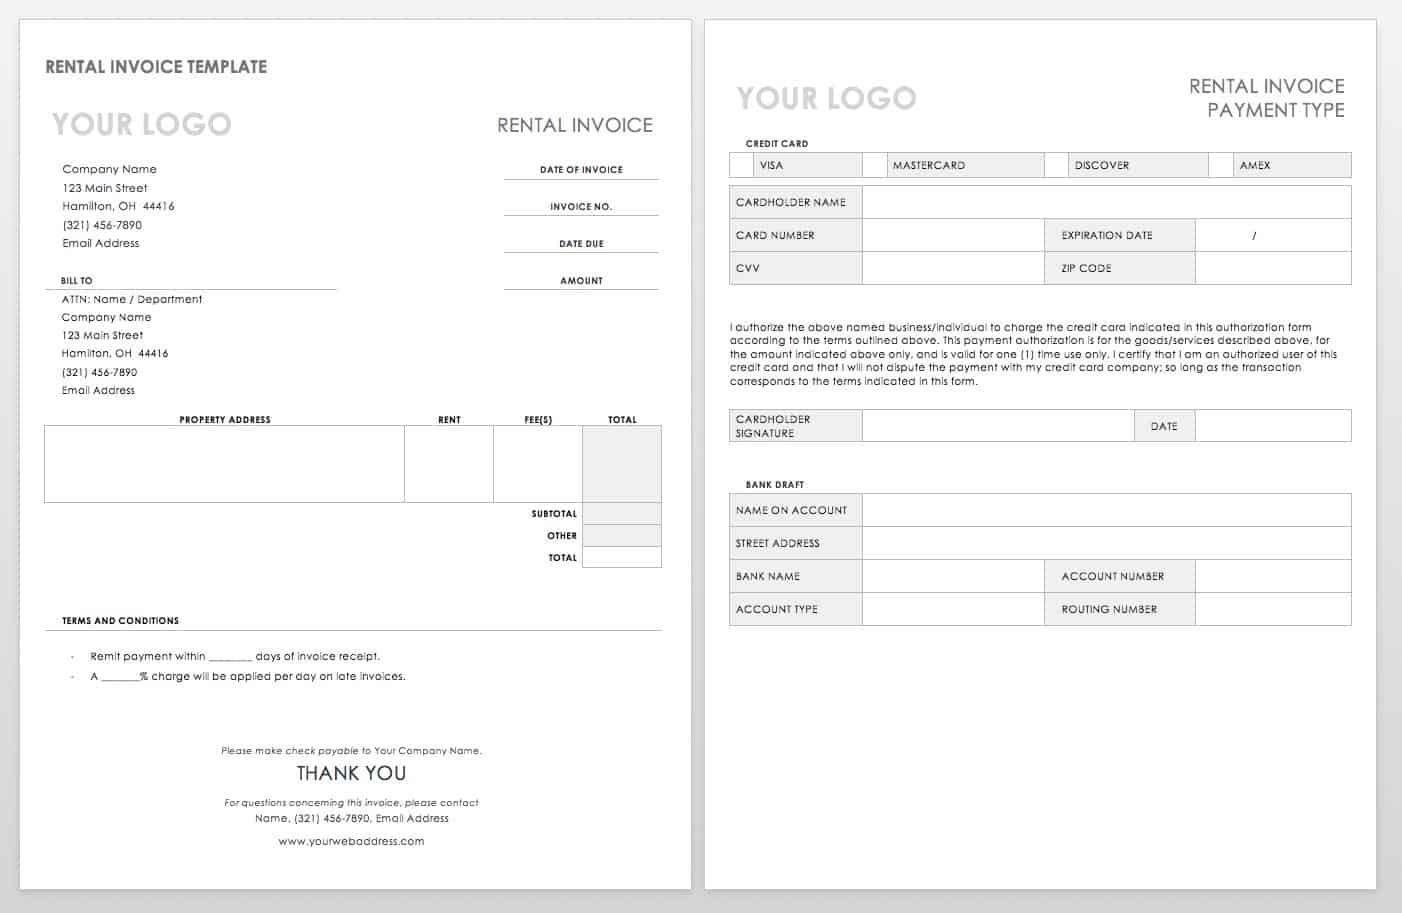 Free Ms Word Invoices Templates Smartsheet With Free Downloadable Invoice Template For Word Invoice Template Invoice Template Word Printable Invoice